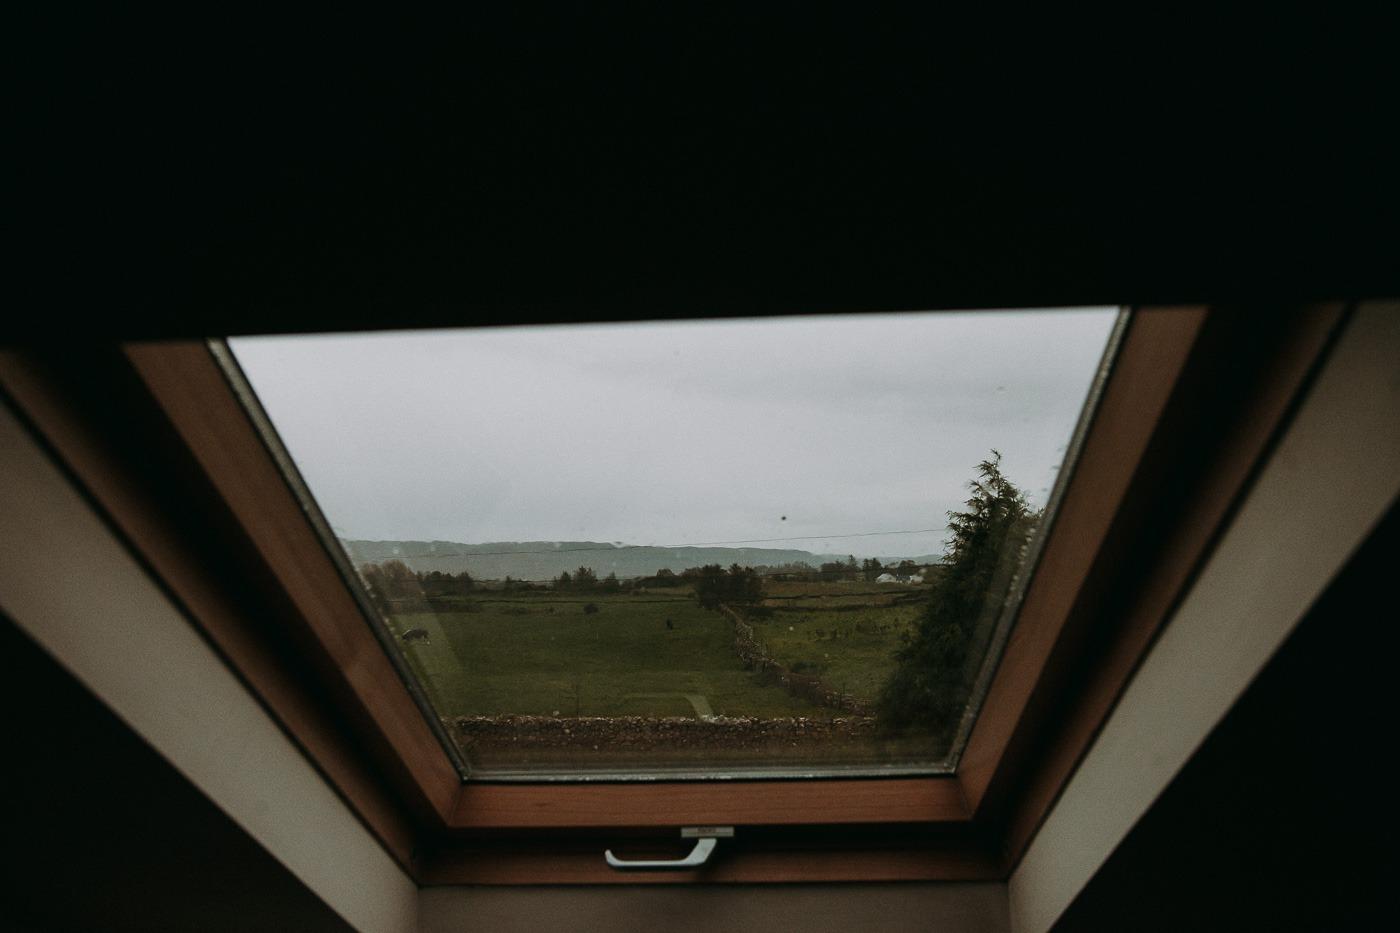 A screen shot of a window